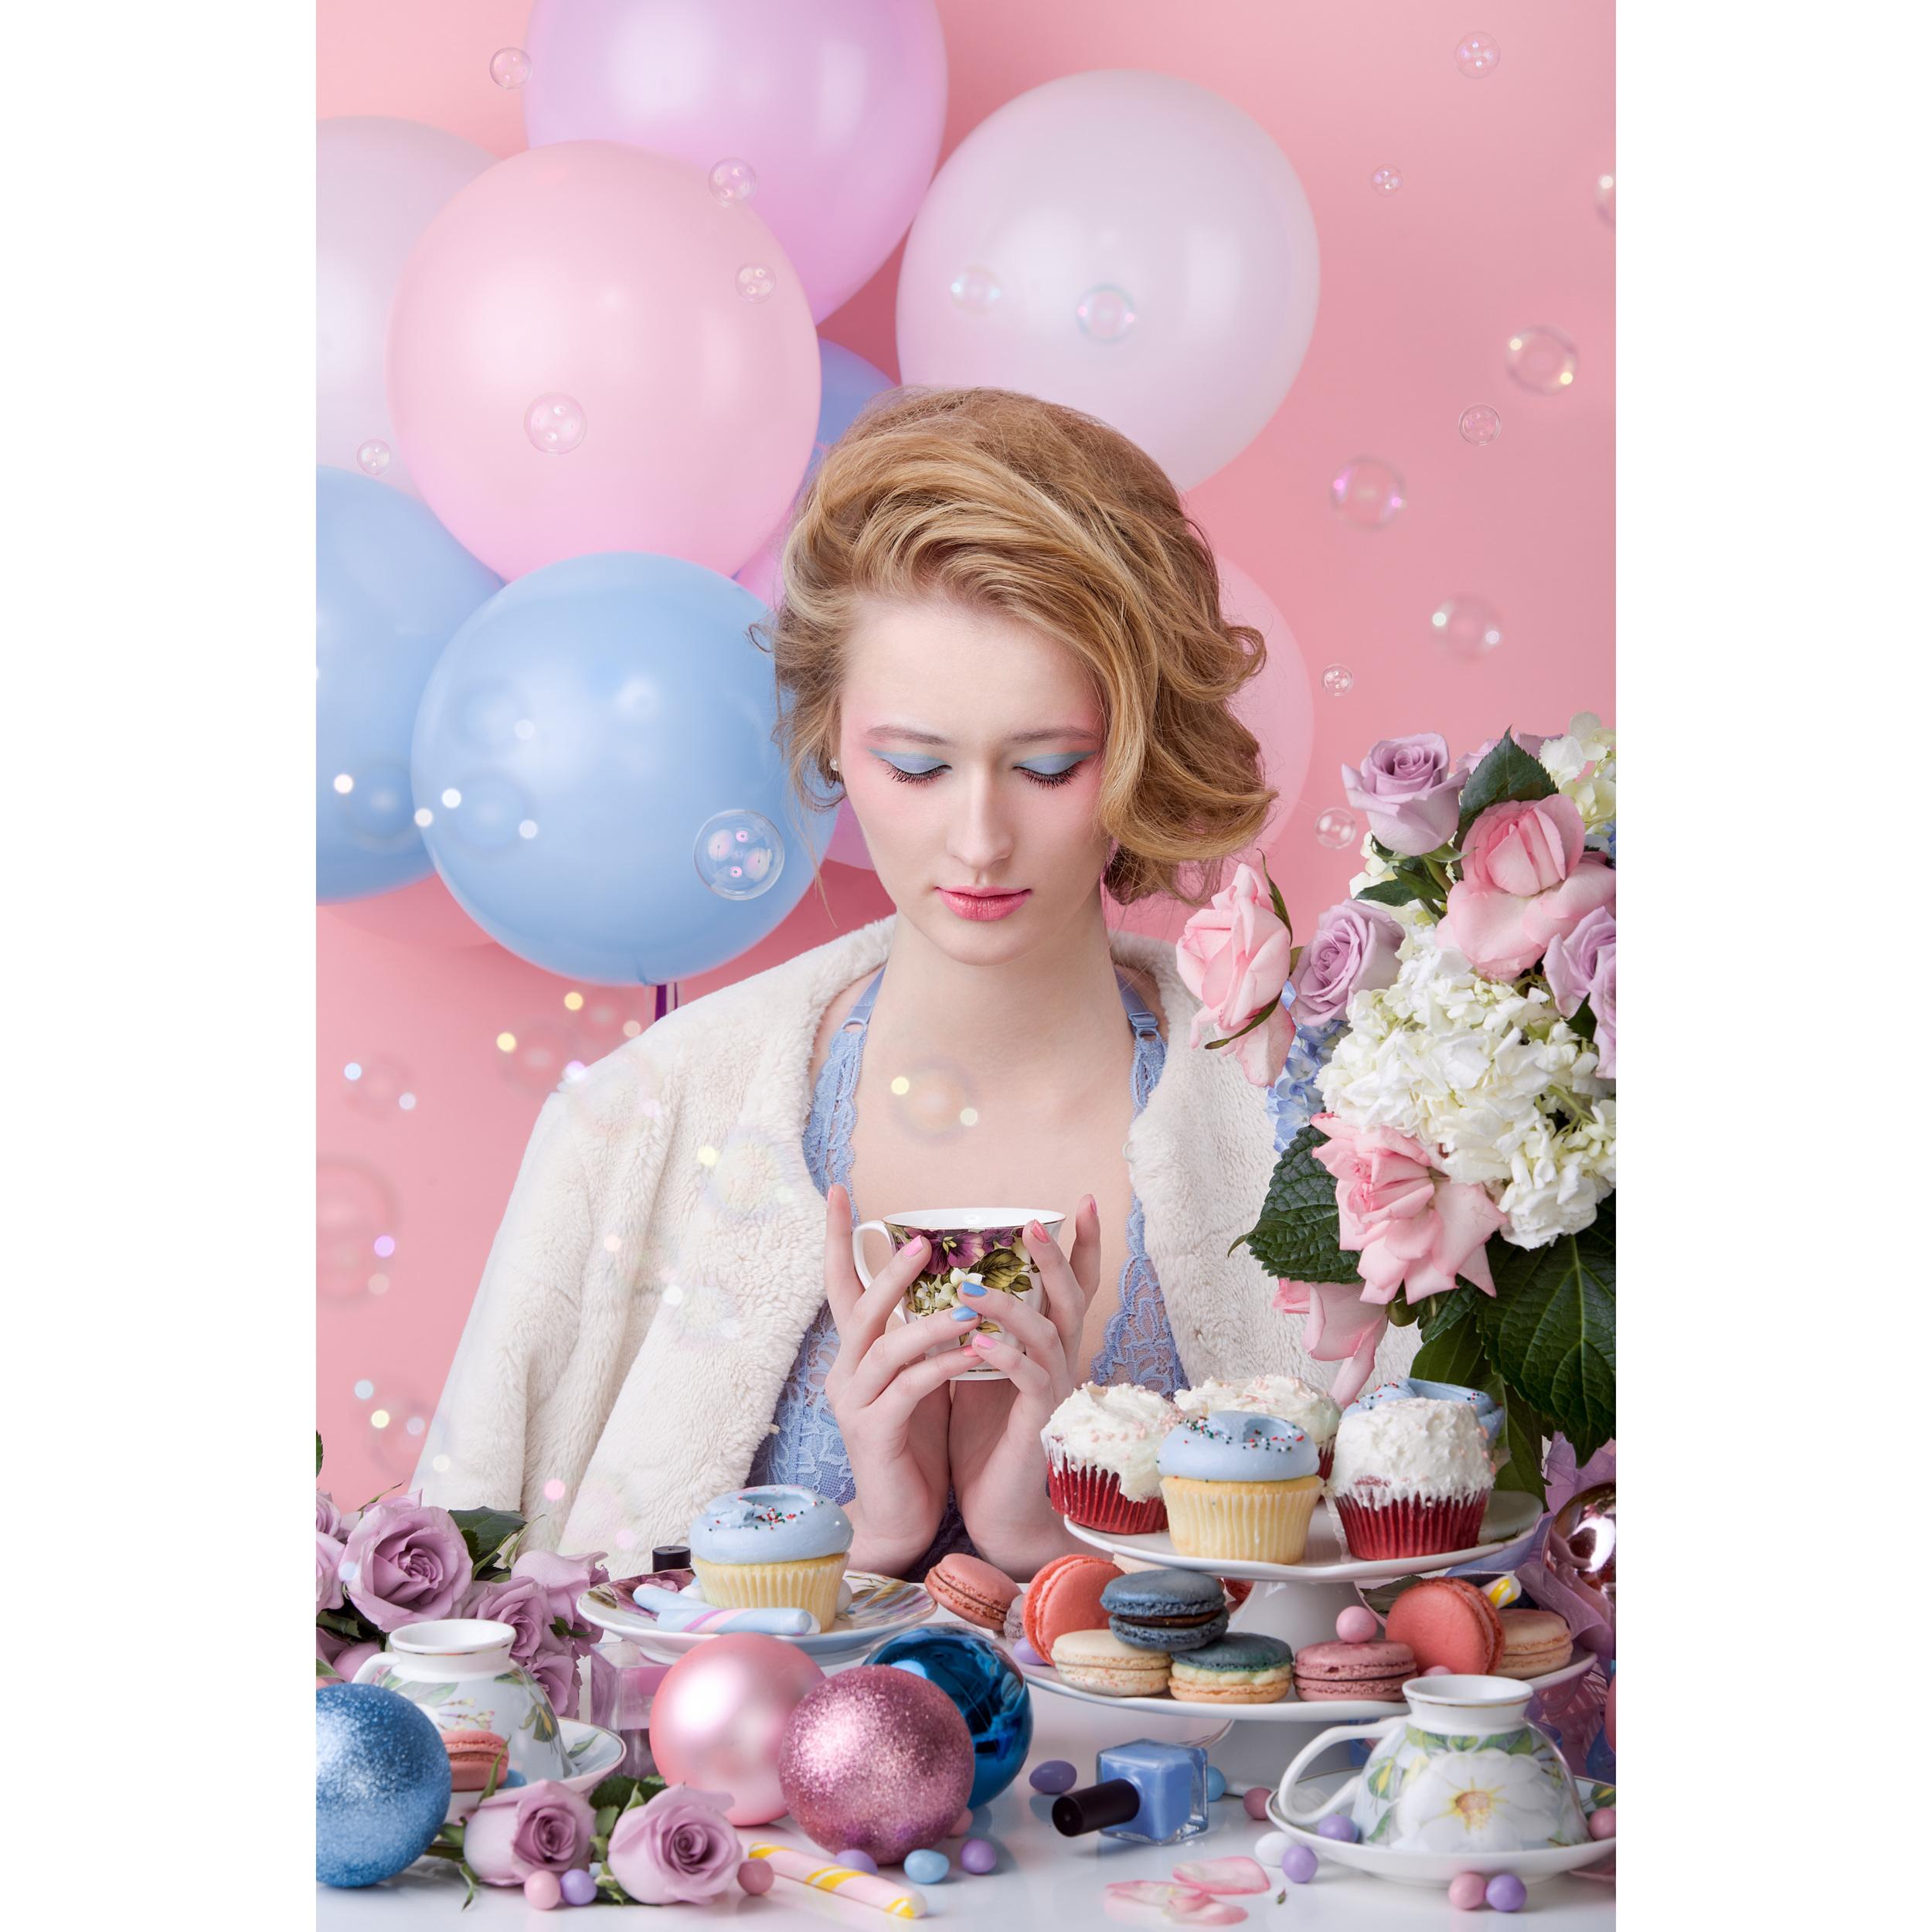 Candy DreamC151220 Maria-2879-Edit copy.jpg